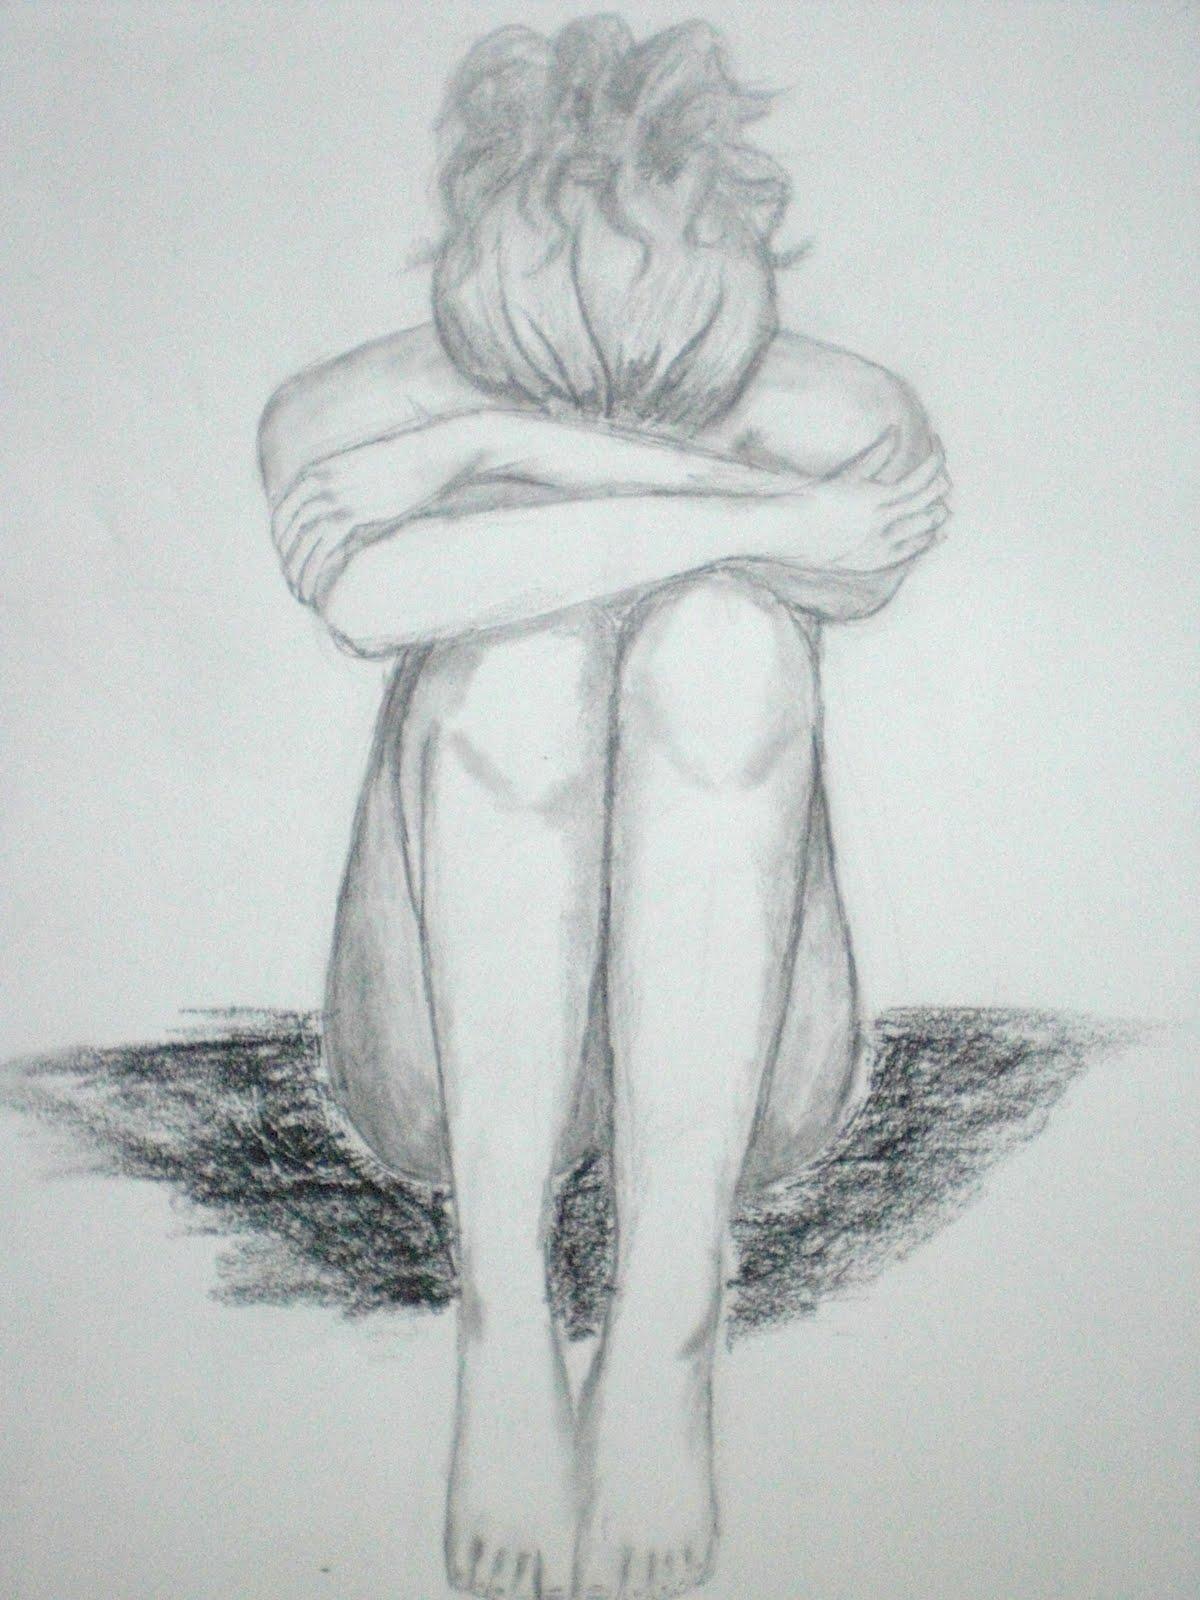 Drawn sad happiness Ve Drawing BoyamaTeknikleri really love